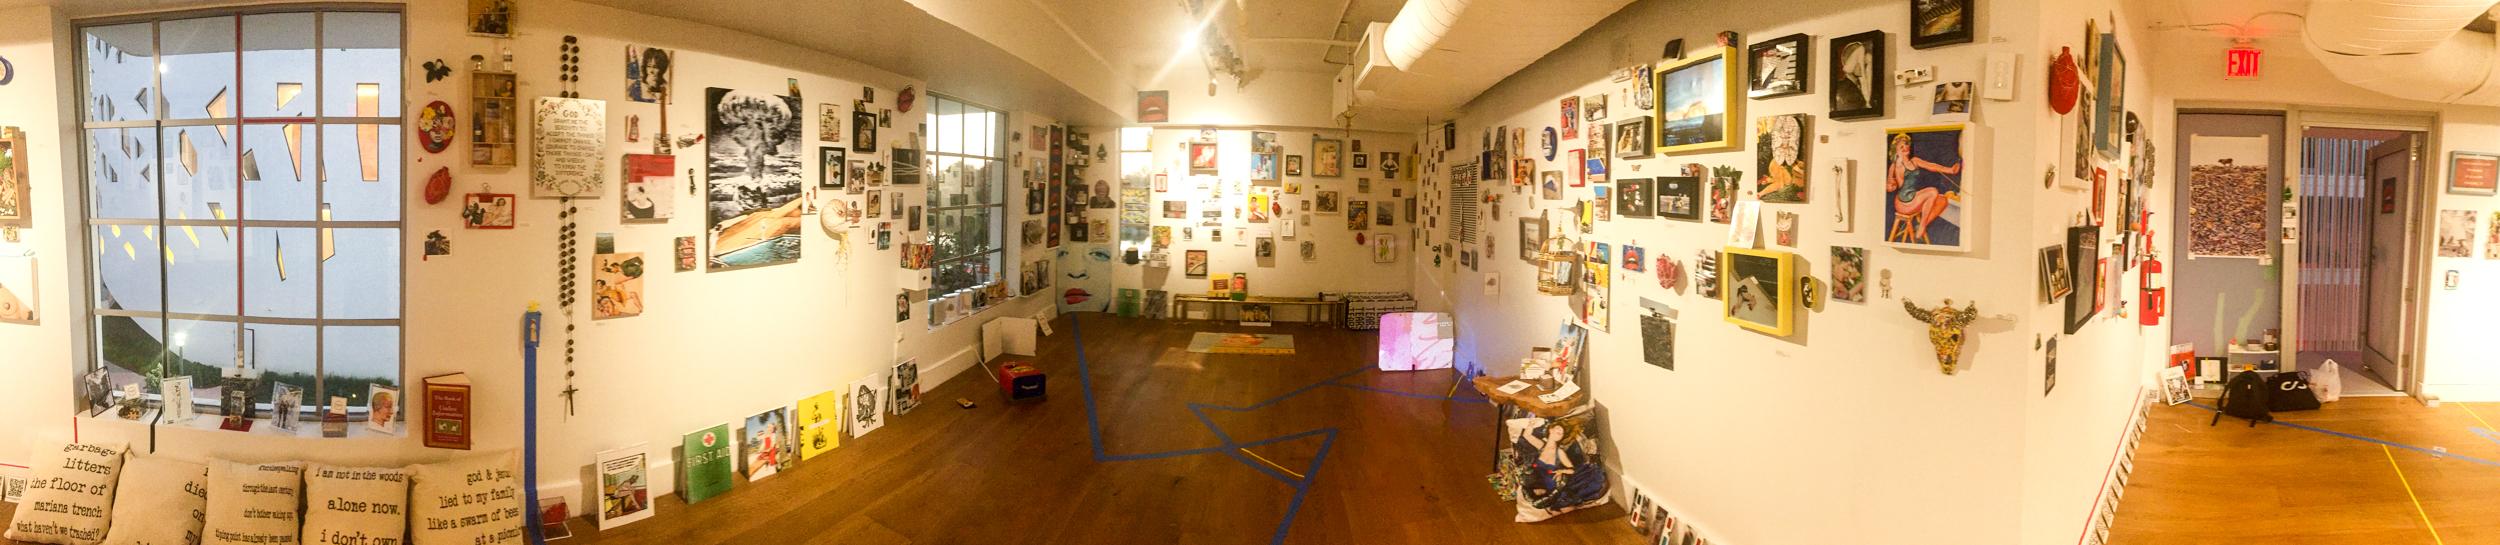 Faena-Exhibition-Images-8.jpg